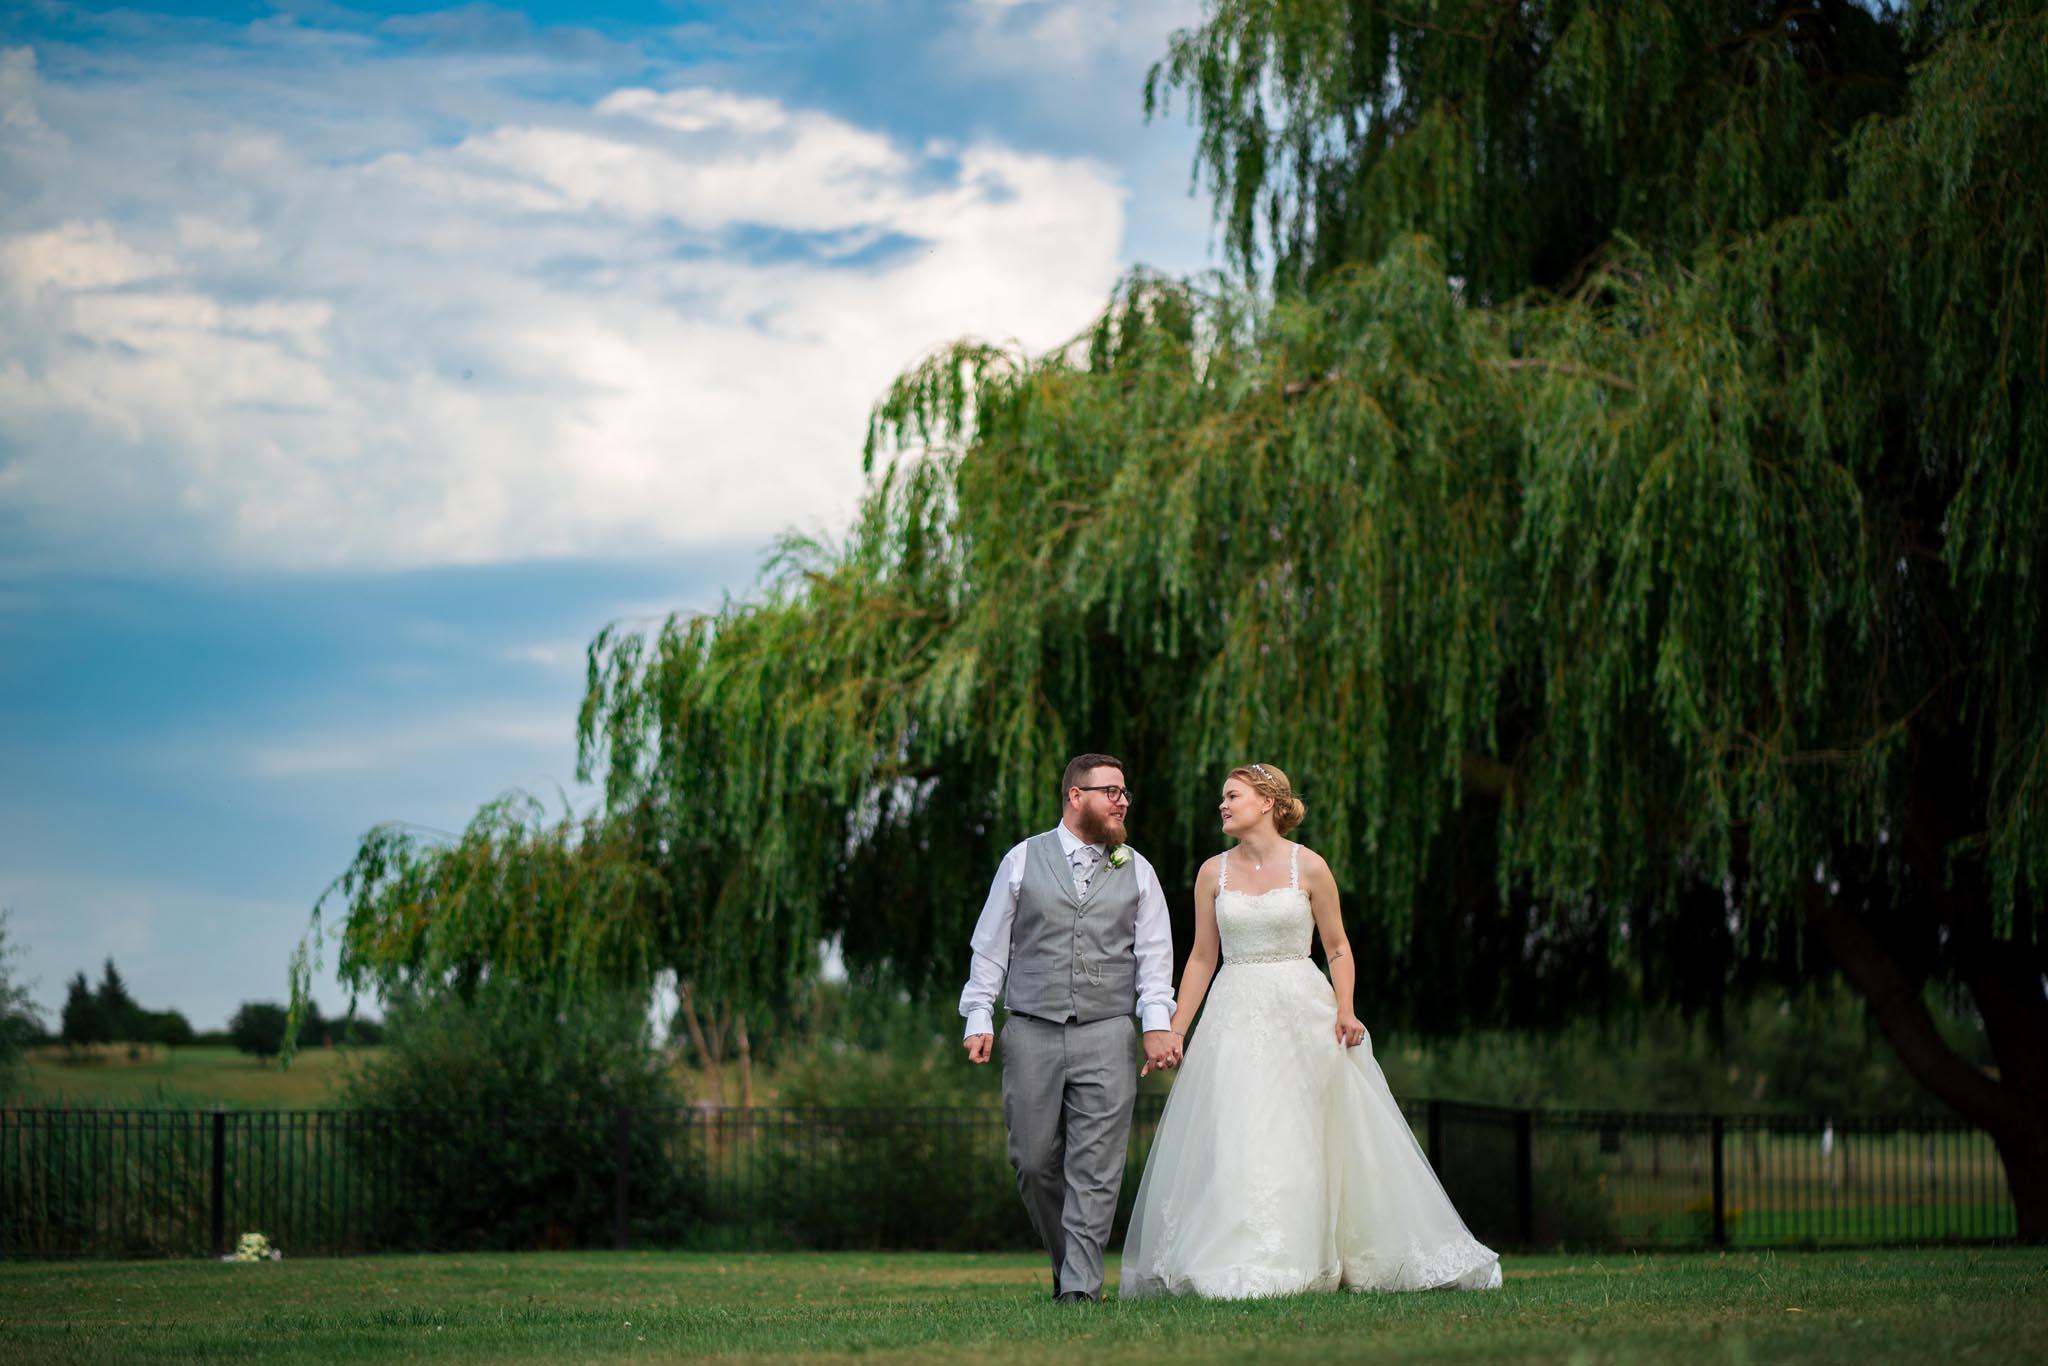 538-Bride-groom-Luke-Yasmin-The-Rayleigh-Club-Wedding-Photography.jpg